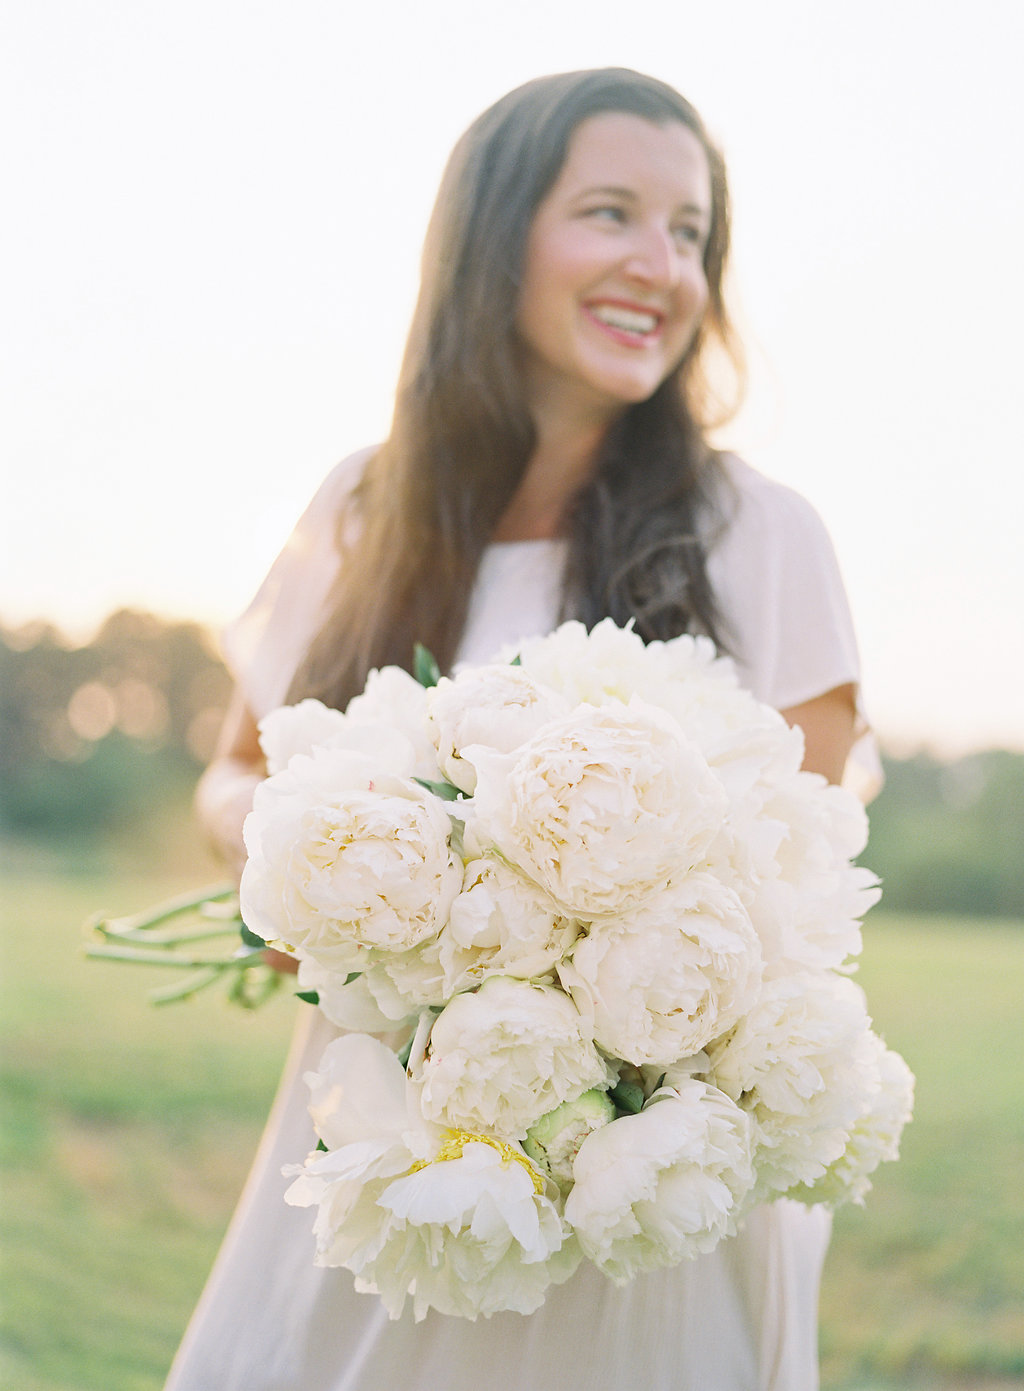 Jessica-Zimmerman-Events-Top-Floral-Designer-Wedding-Planner.jpg